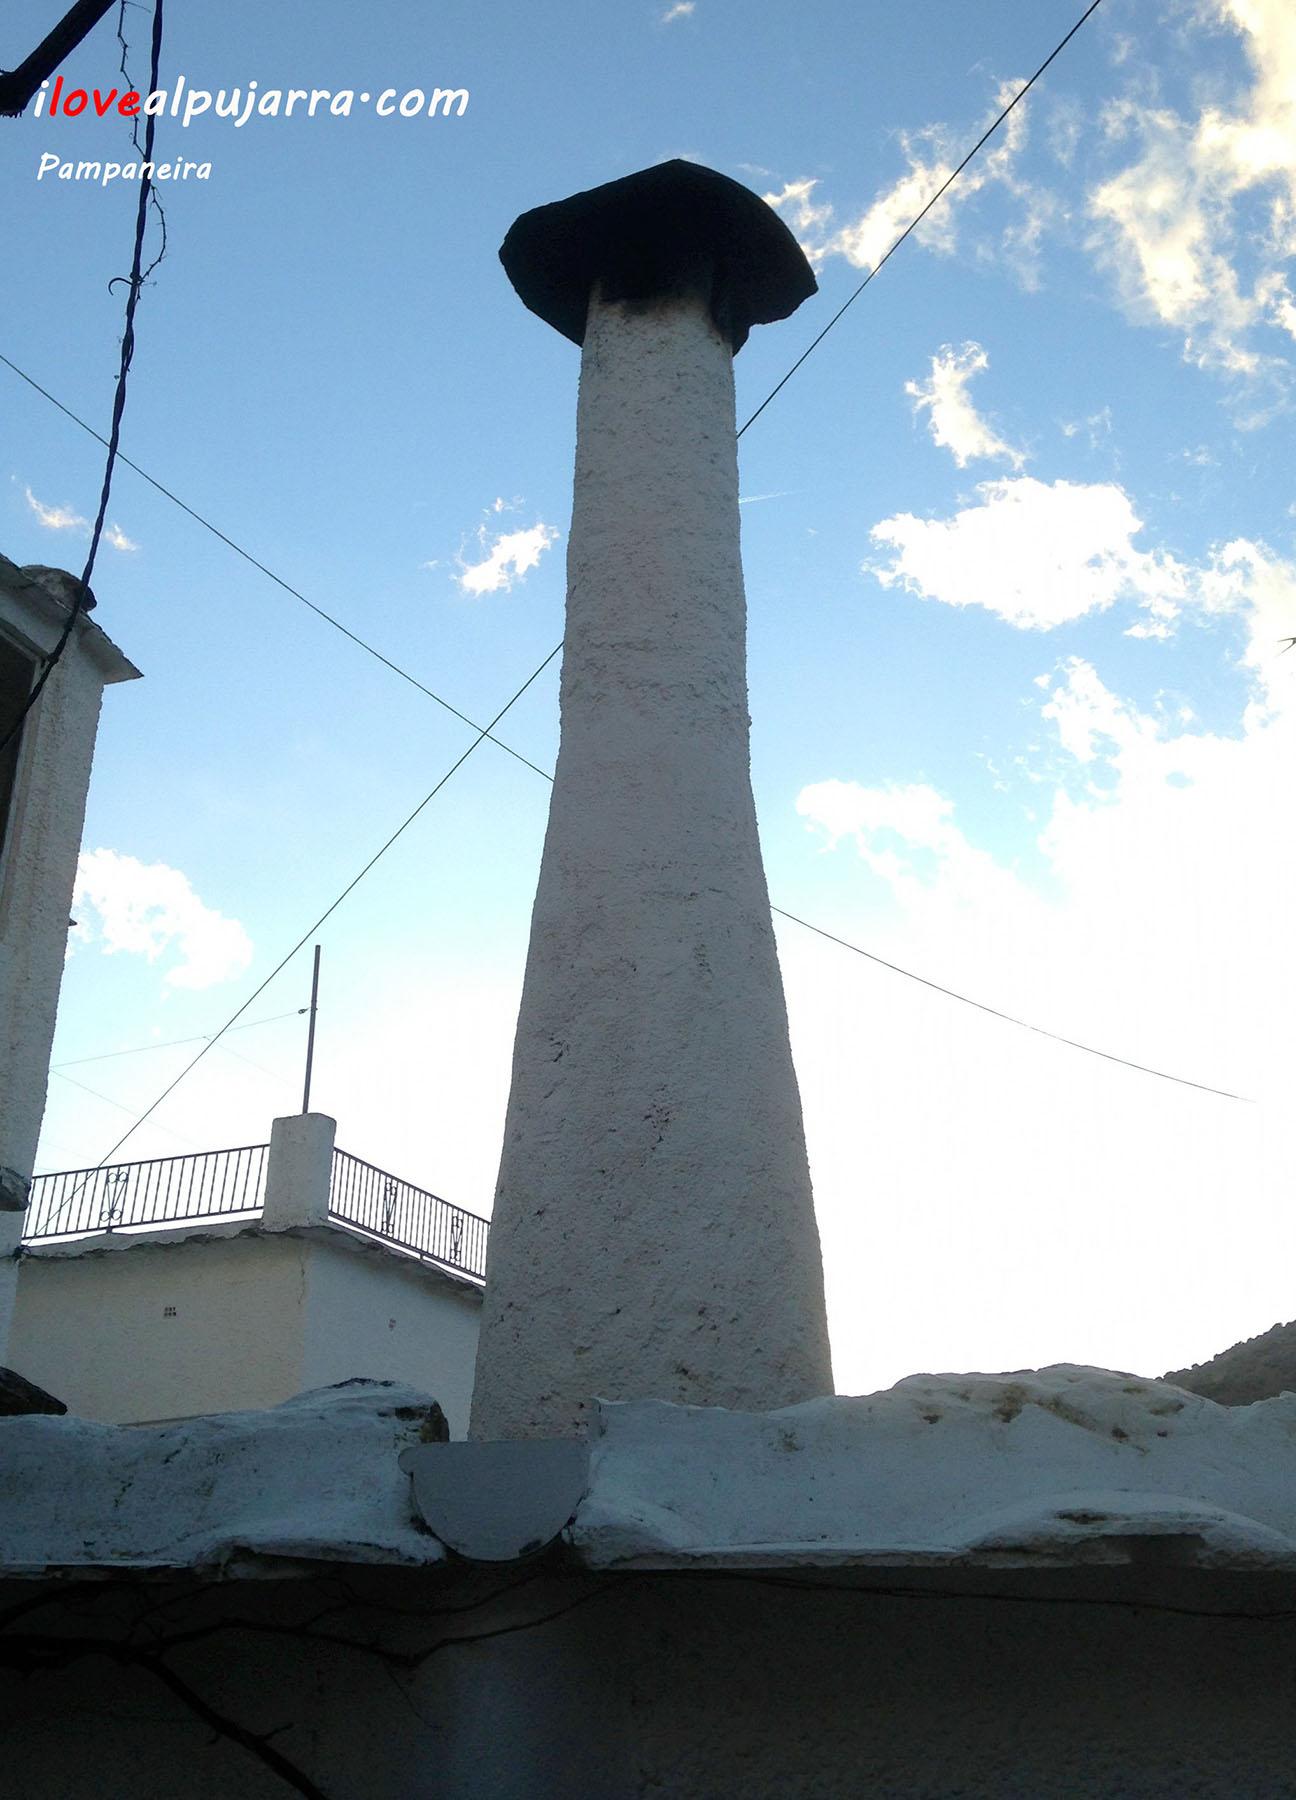 Chimenea en Pampaneira